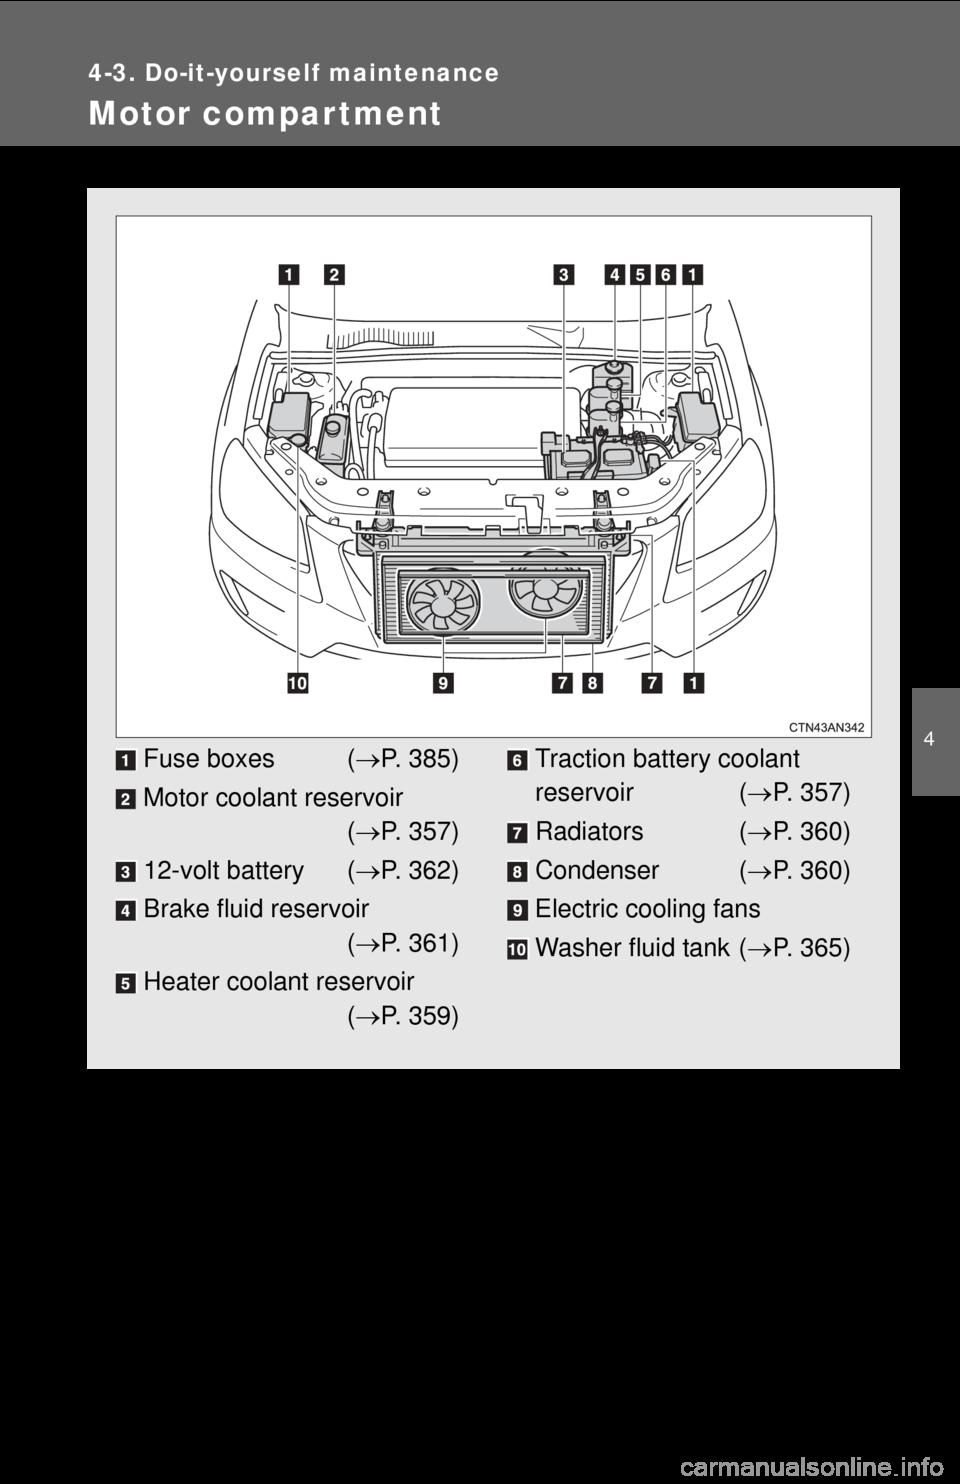 TOYOTA RAV4 EV 2013 1.G Owners Manual, Page 355